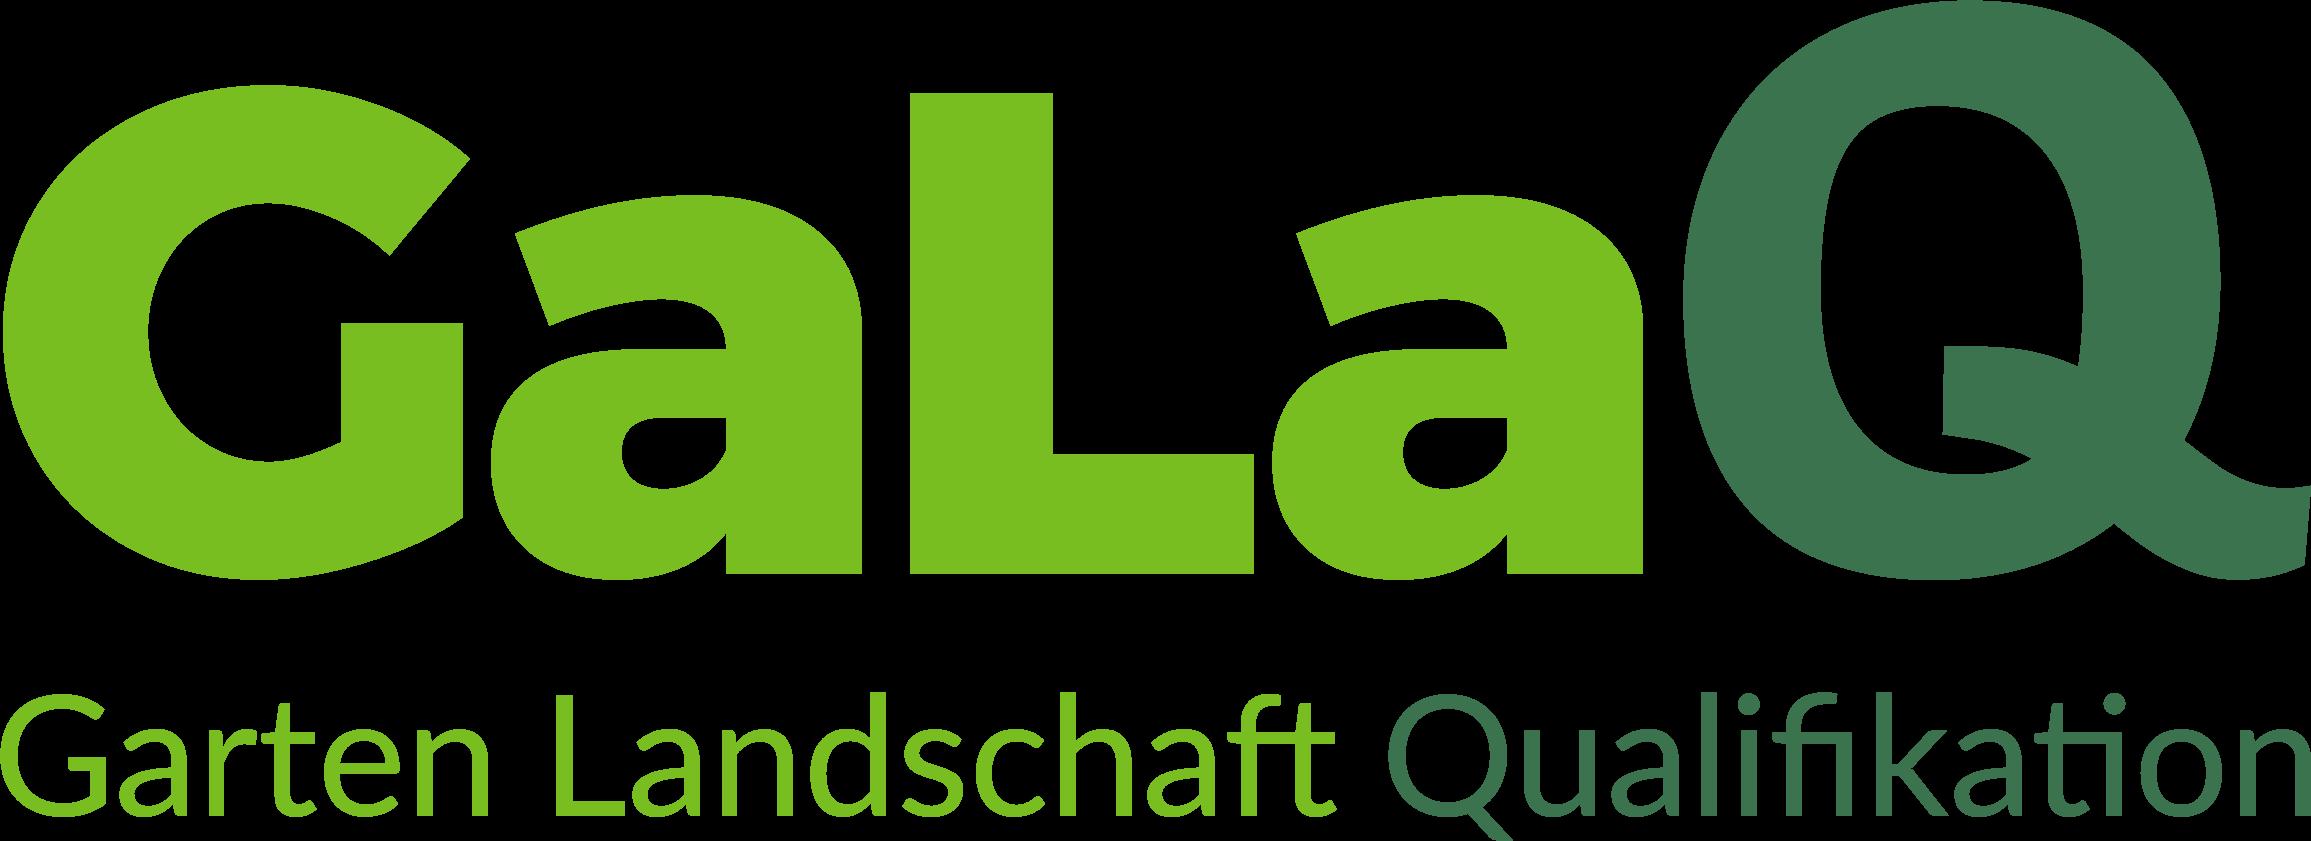 Fortbildung an der LVG Heidelberg